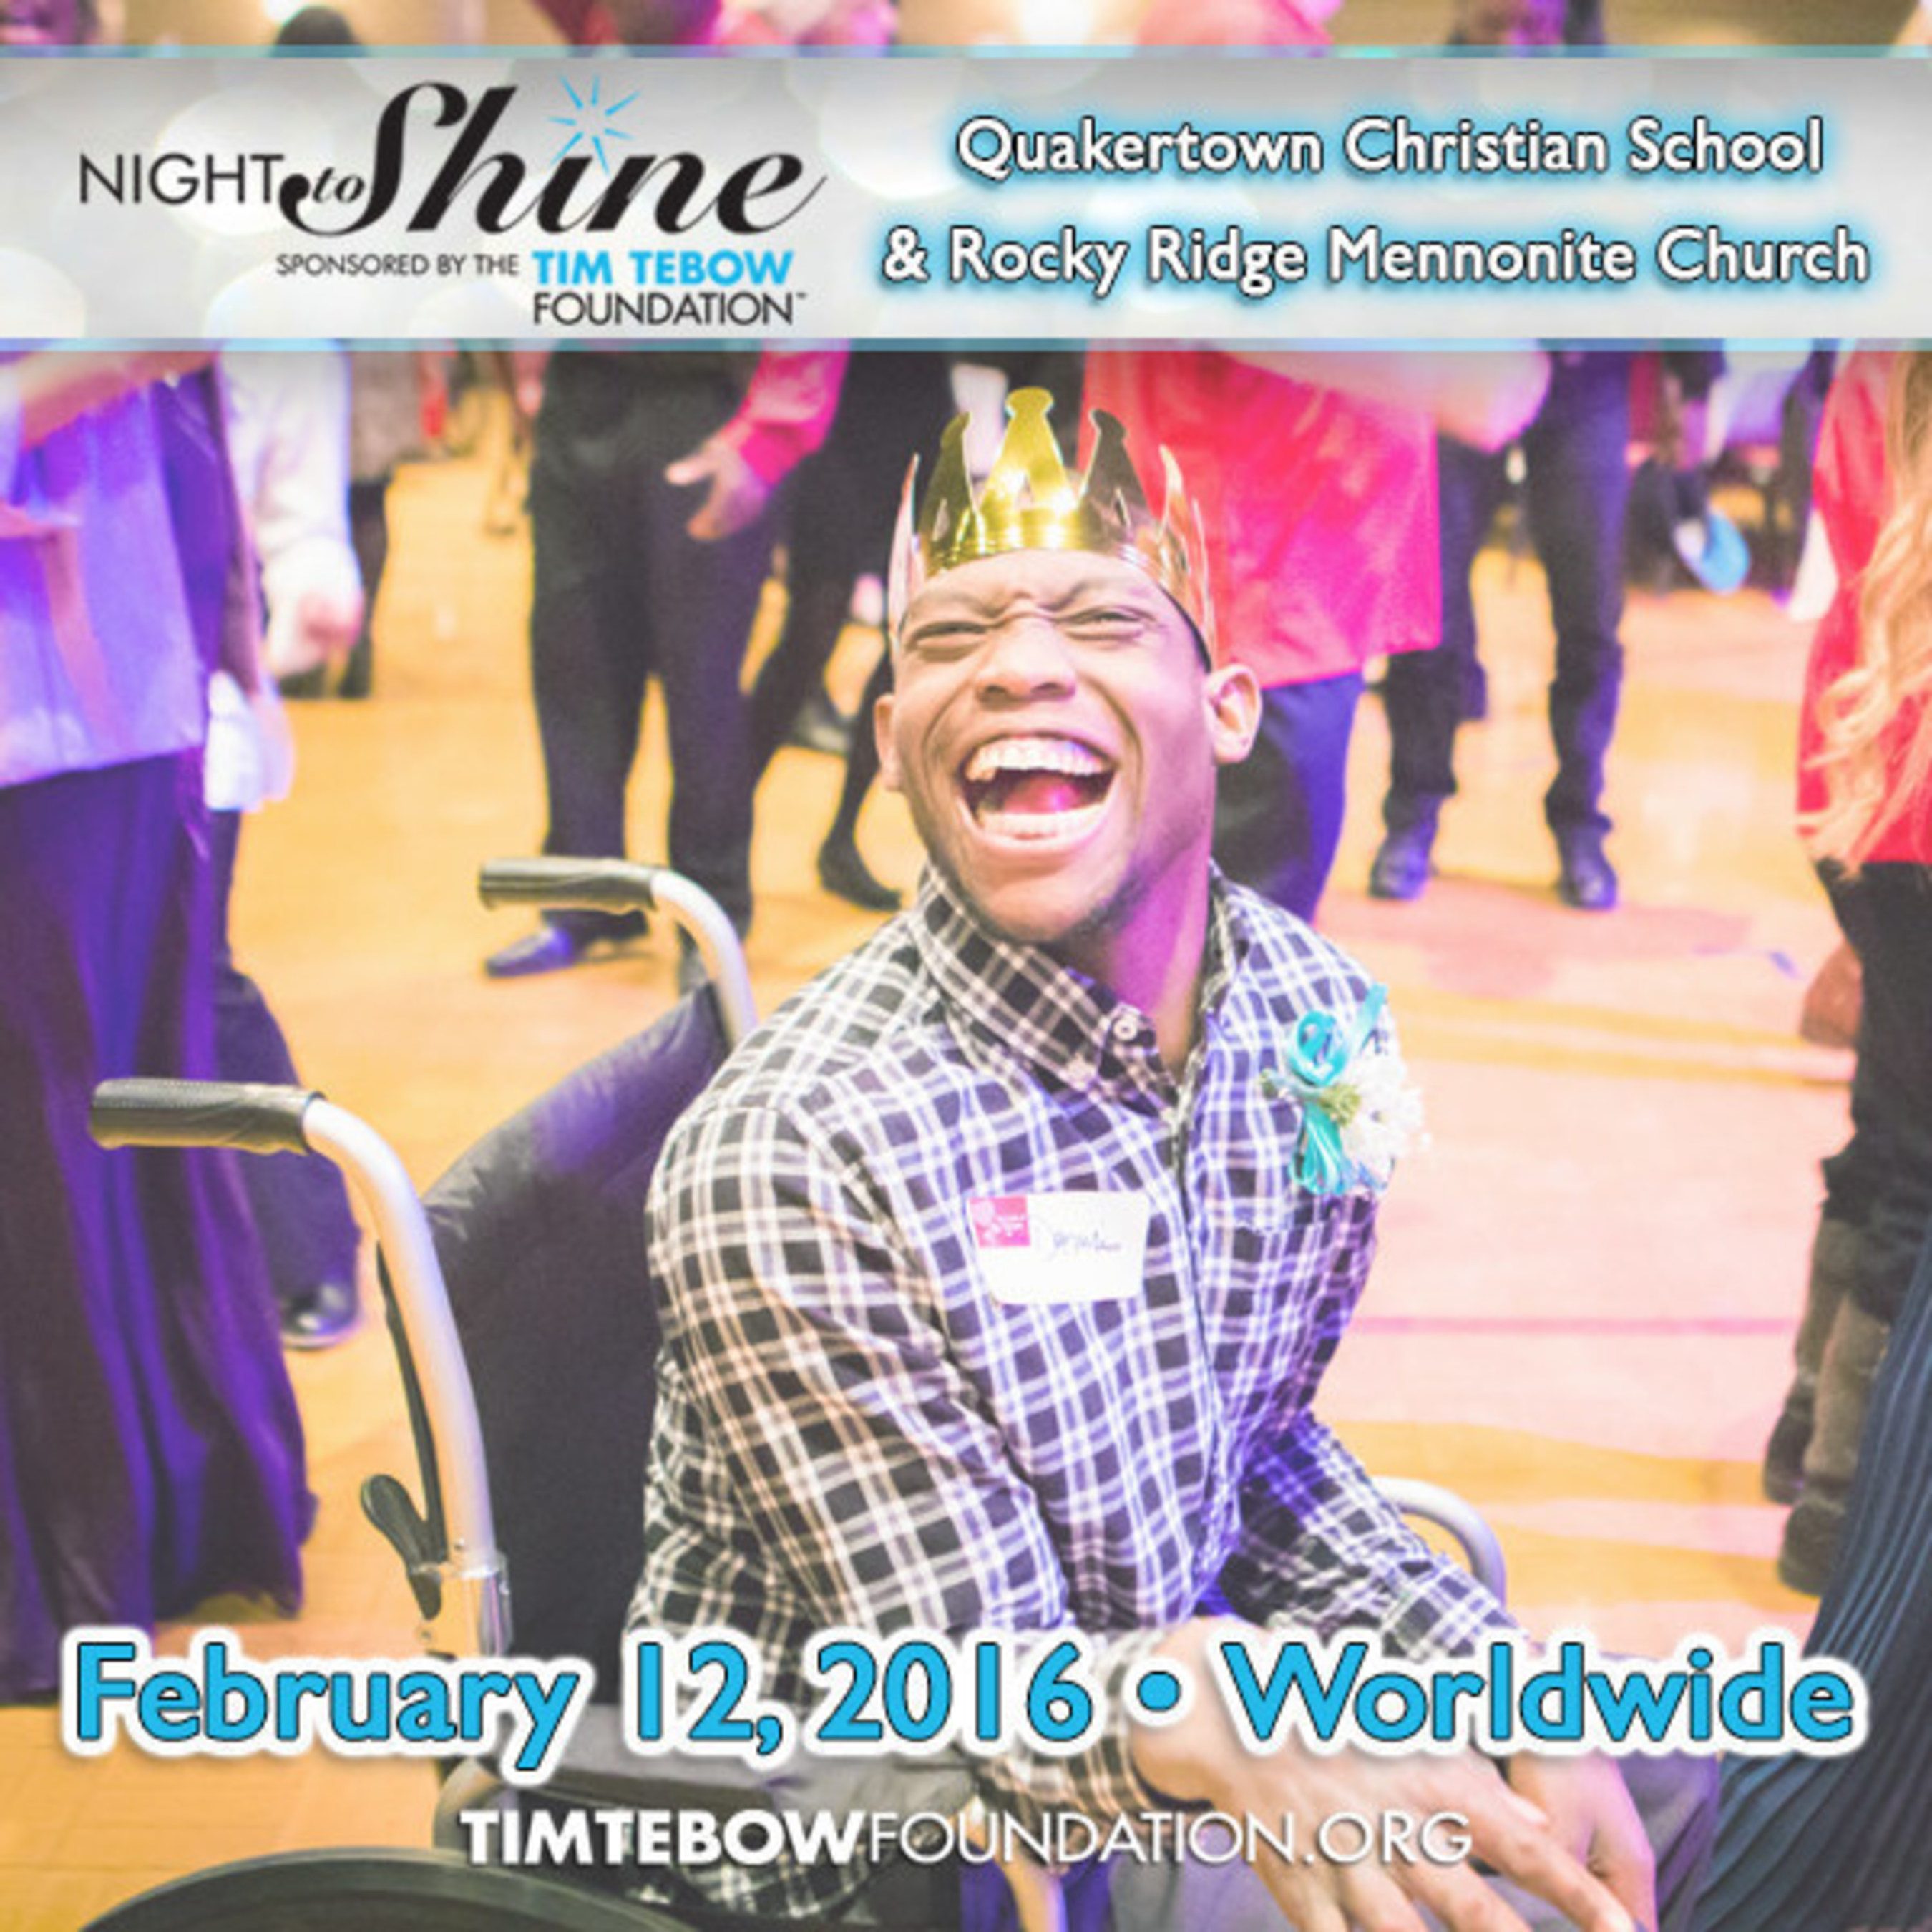 Quakertown Christian School in Partnership with Rocky Ridge Mennonite Church to Host Night to Shine